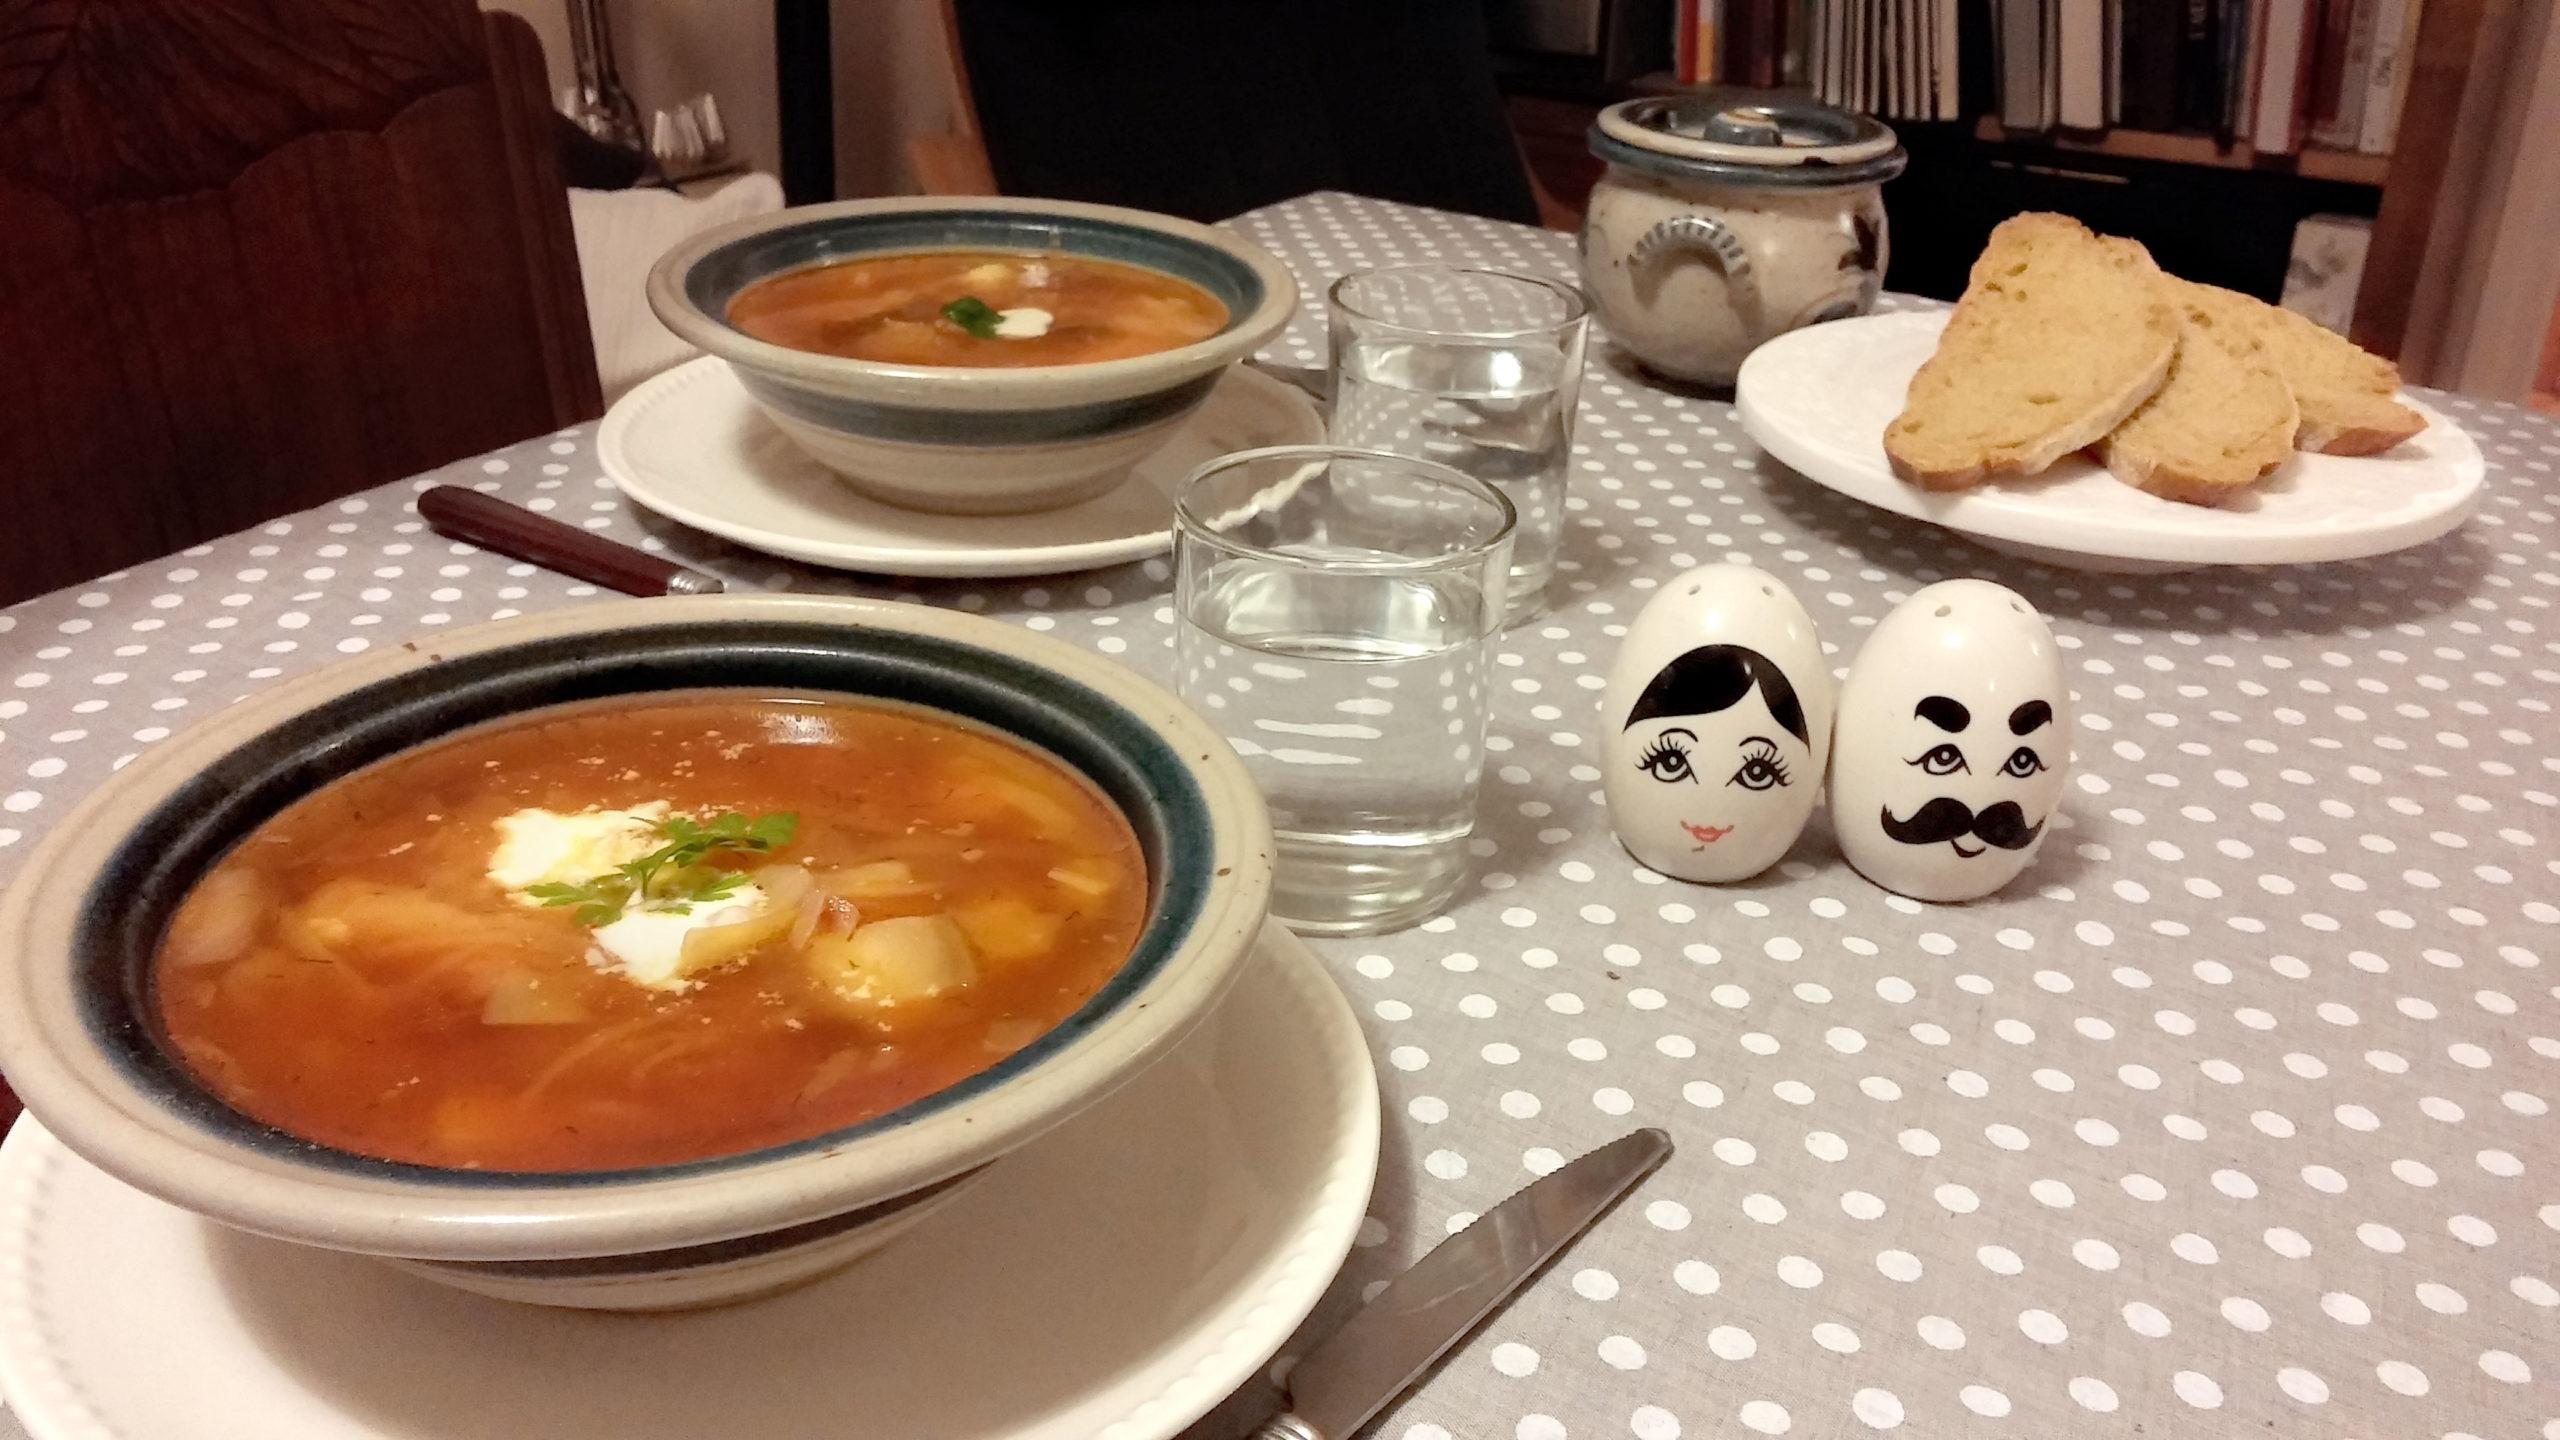 Cuisine russe bortsch traditionnel t - Cuisine traditionnelle russe ...